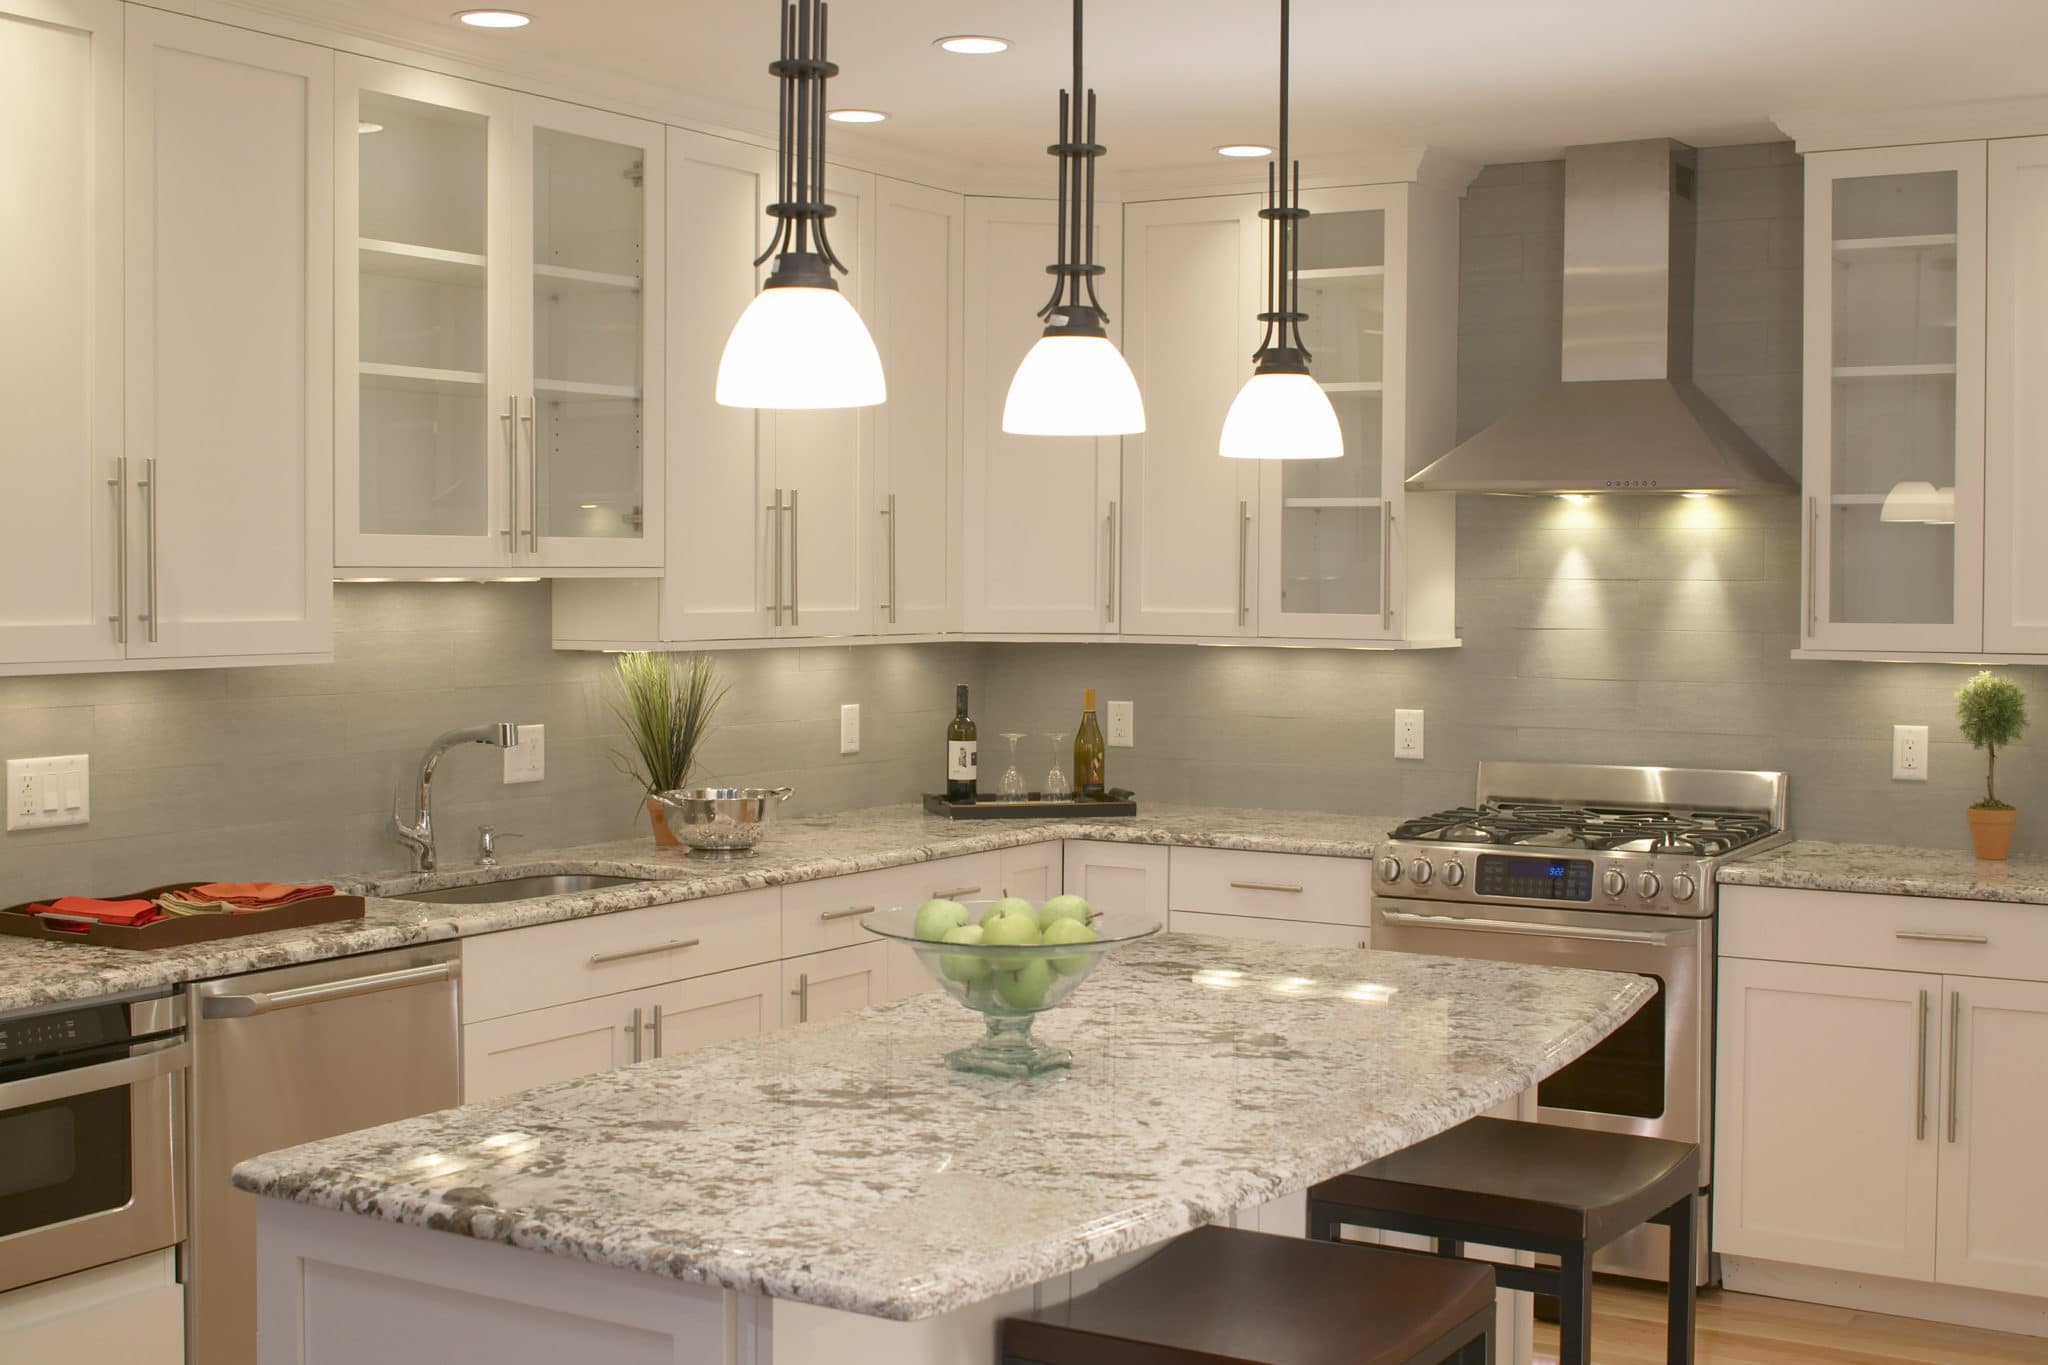 Natural Stone - Metropolitan Cabinets focus keywork